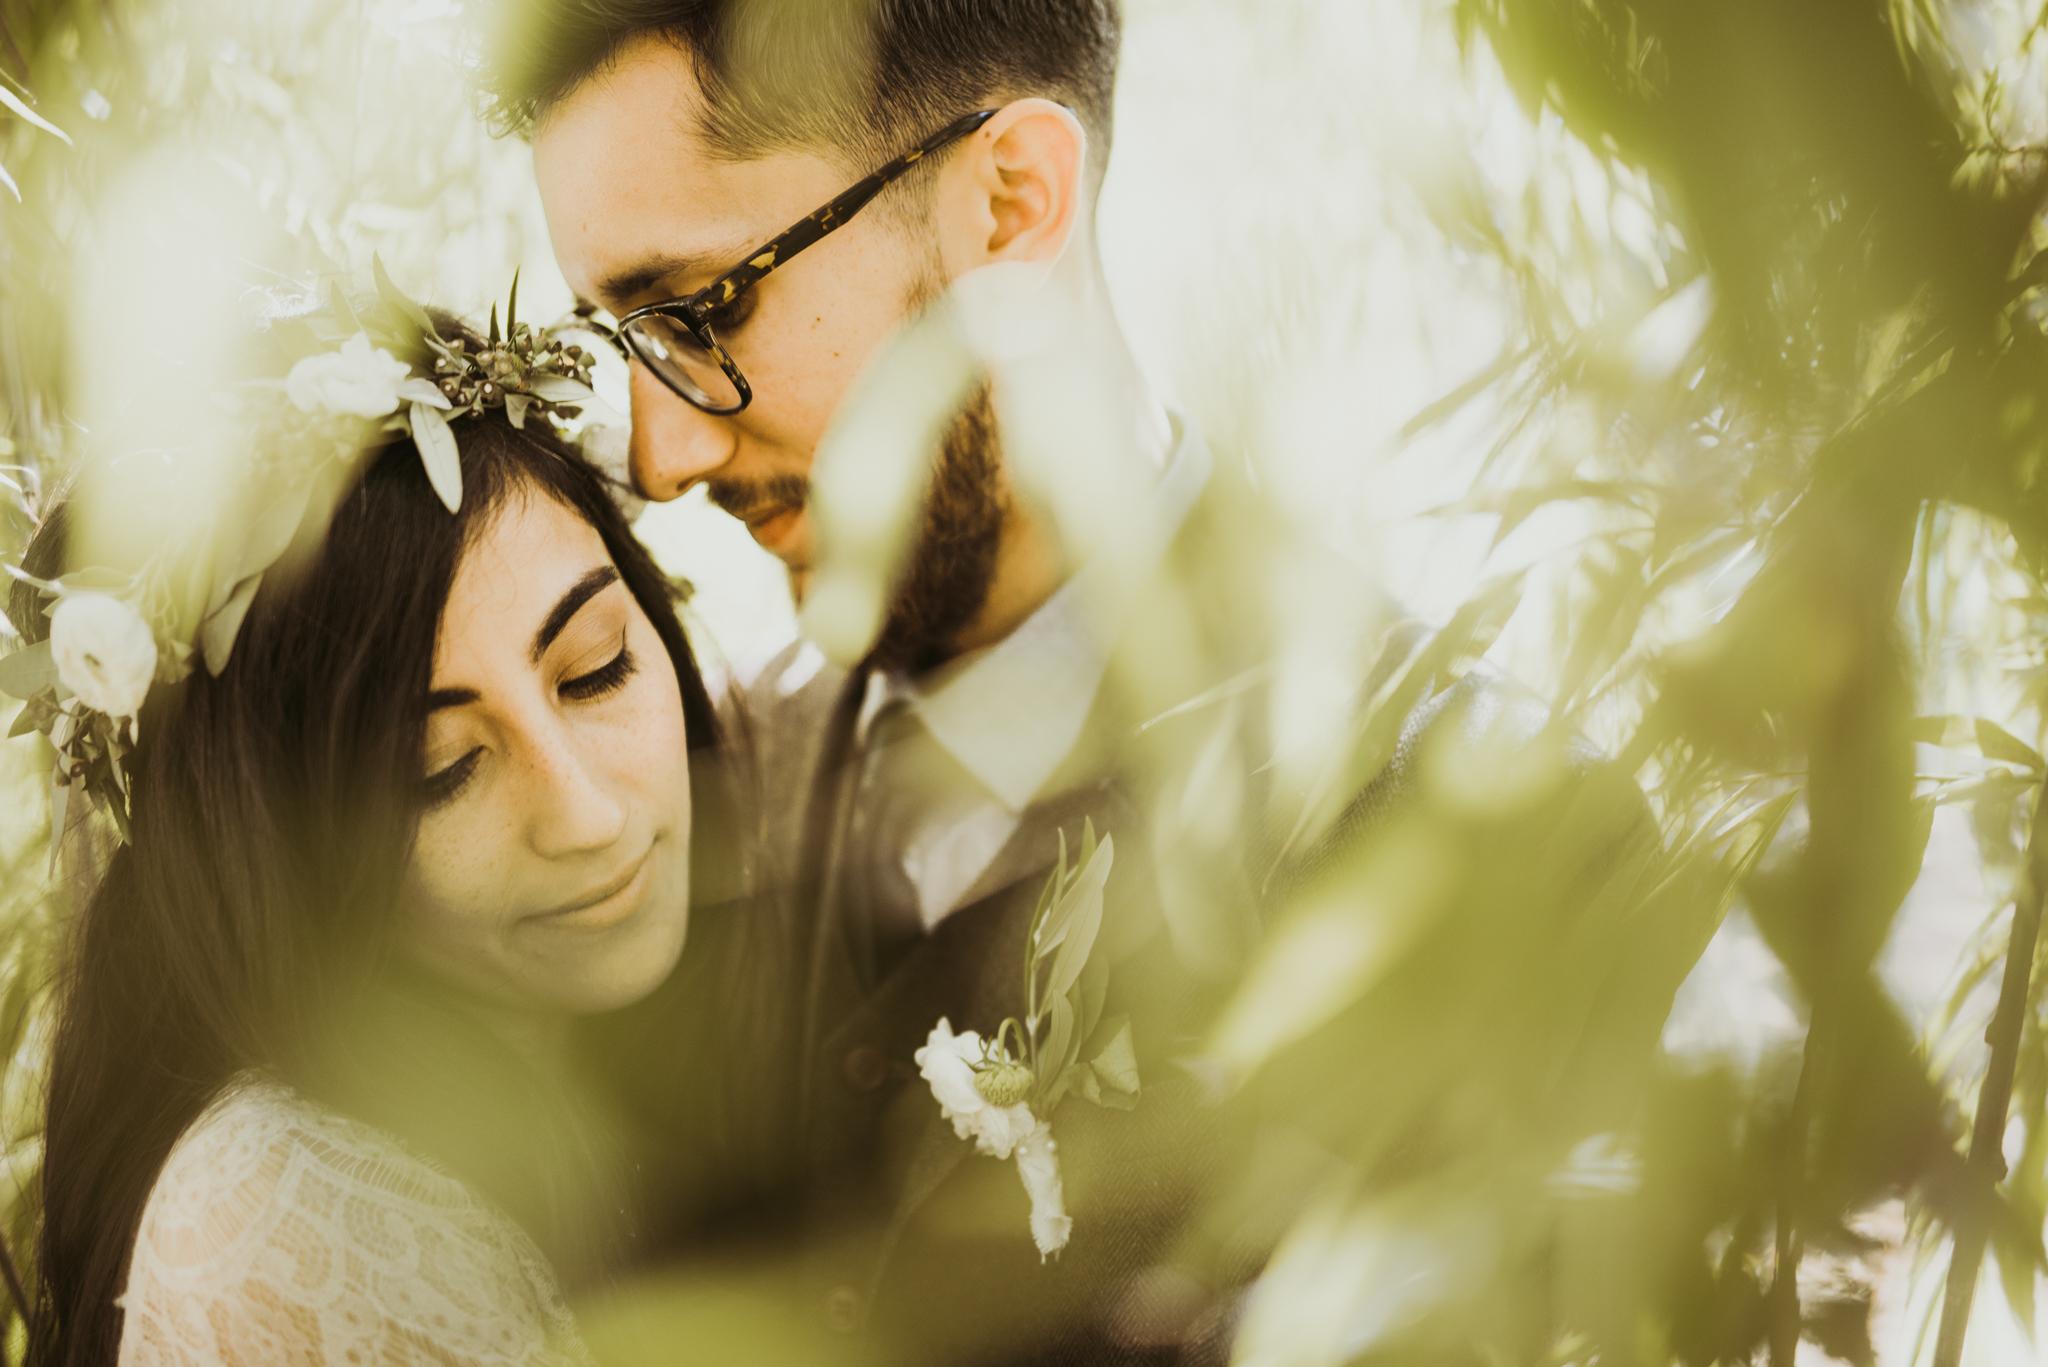 ©Isaiah-&-Taylor-Photography---Oak-Canyon-Nature-Center-Wedding,-Anaheim-Hills-068.jpg